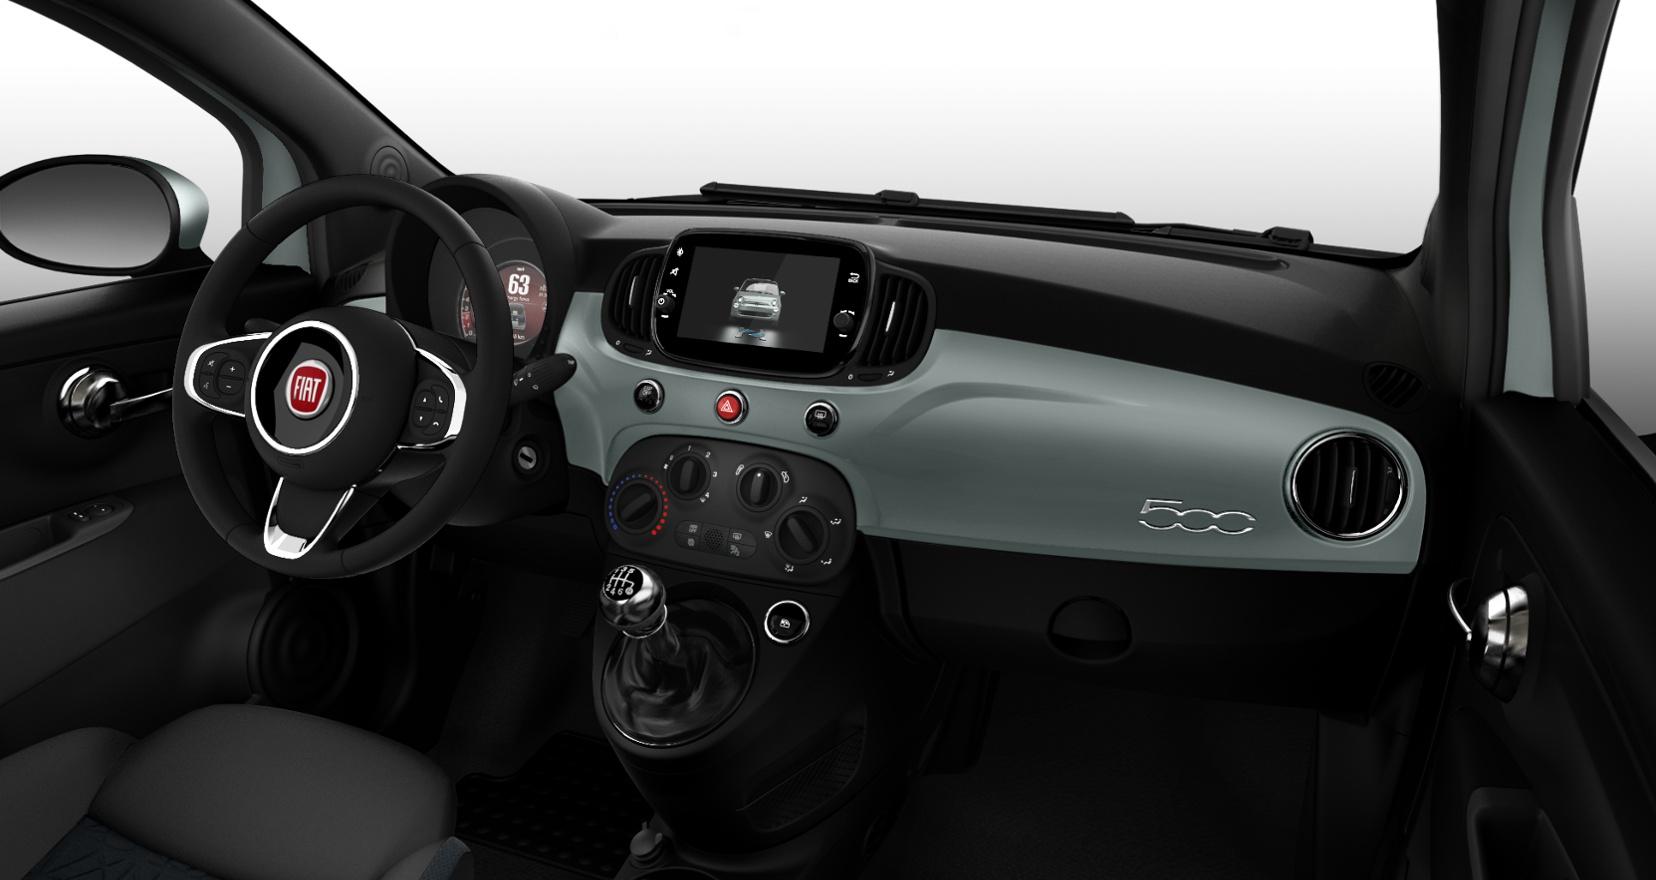 Fiat 500 hybrid launch edition - interieur dashboard